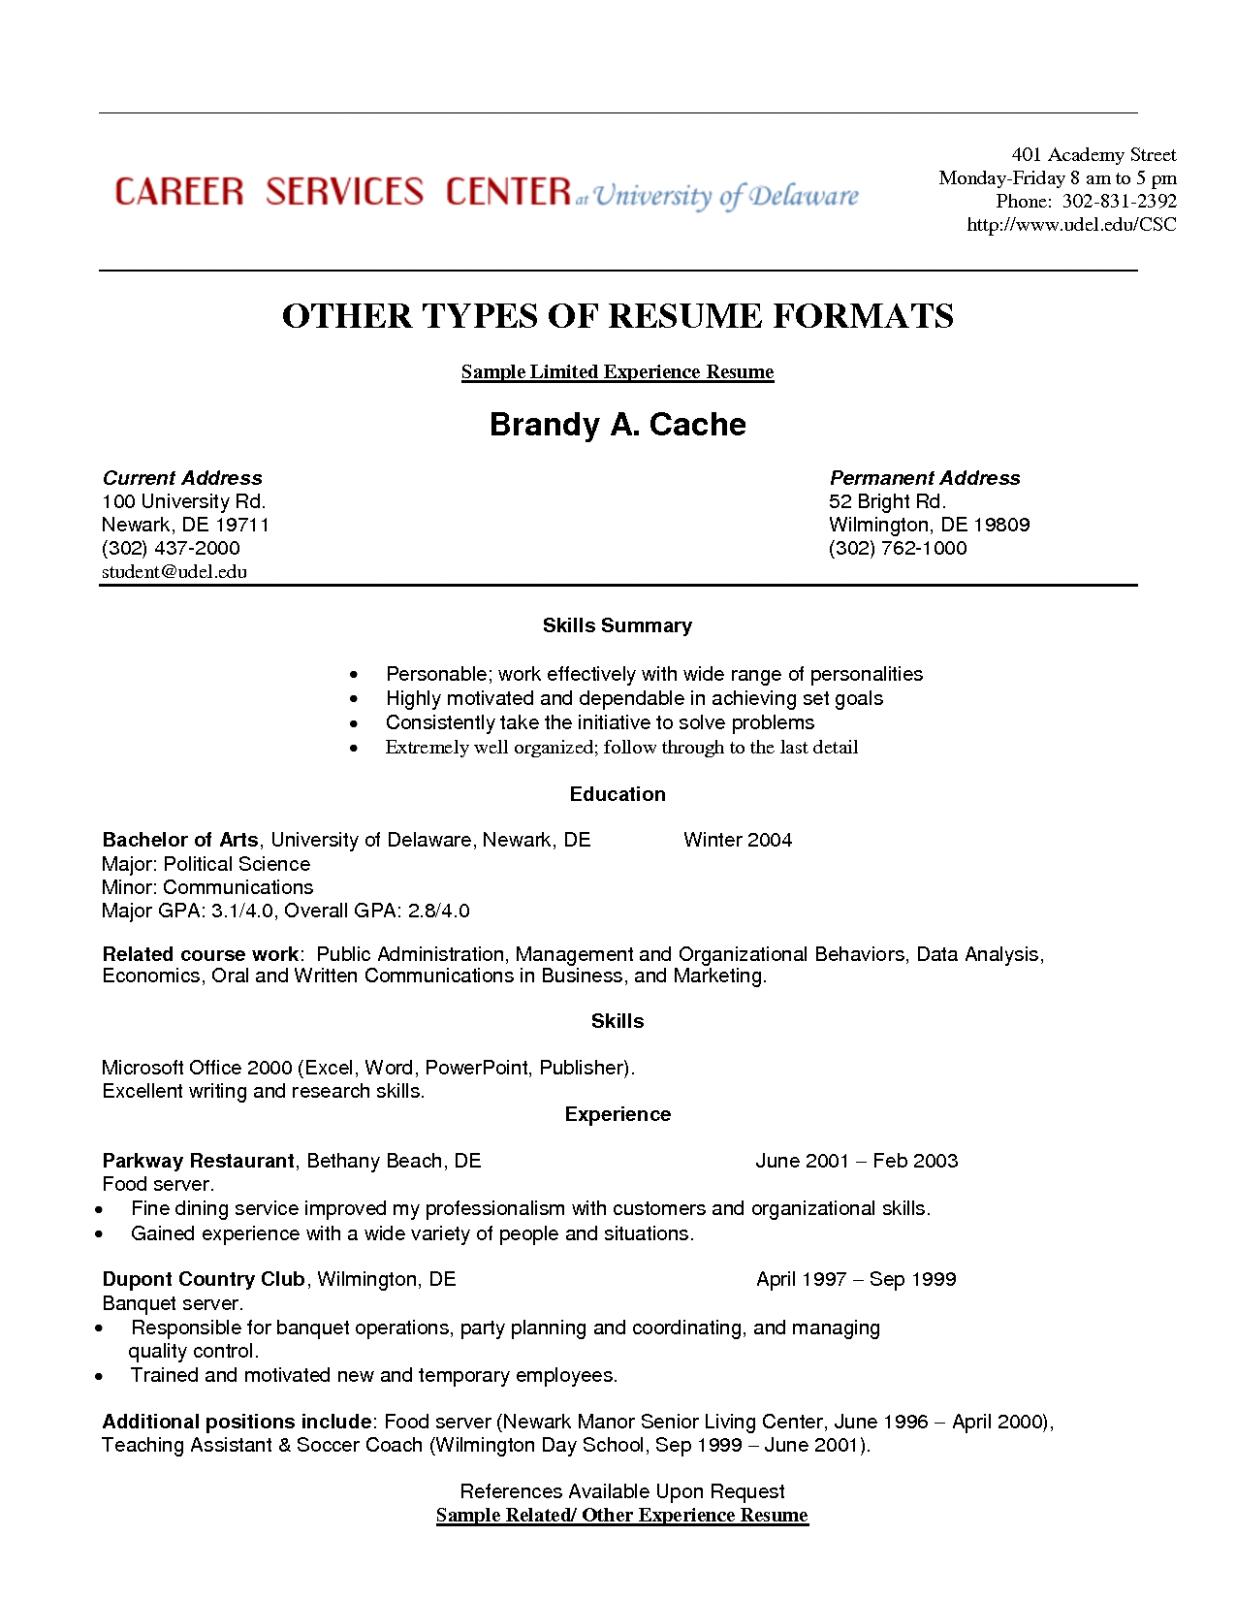 12 Expertise Resume Format Phrase di 2020